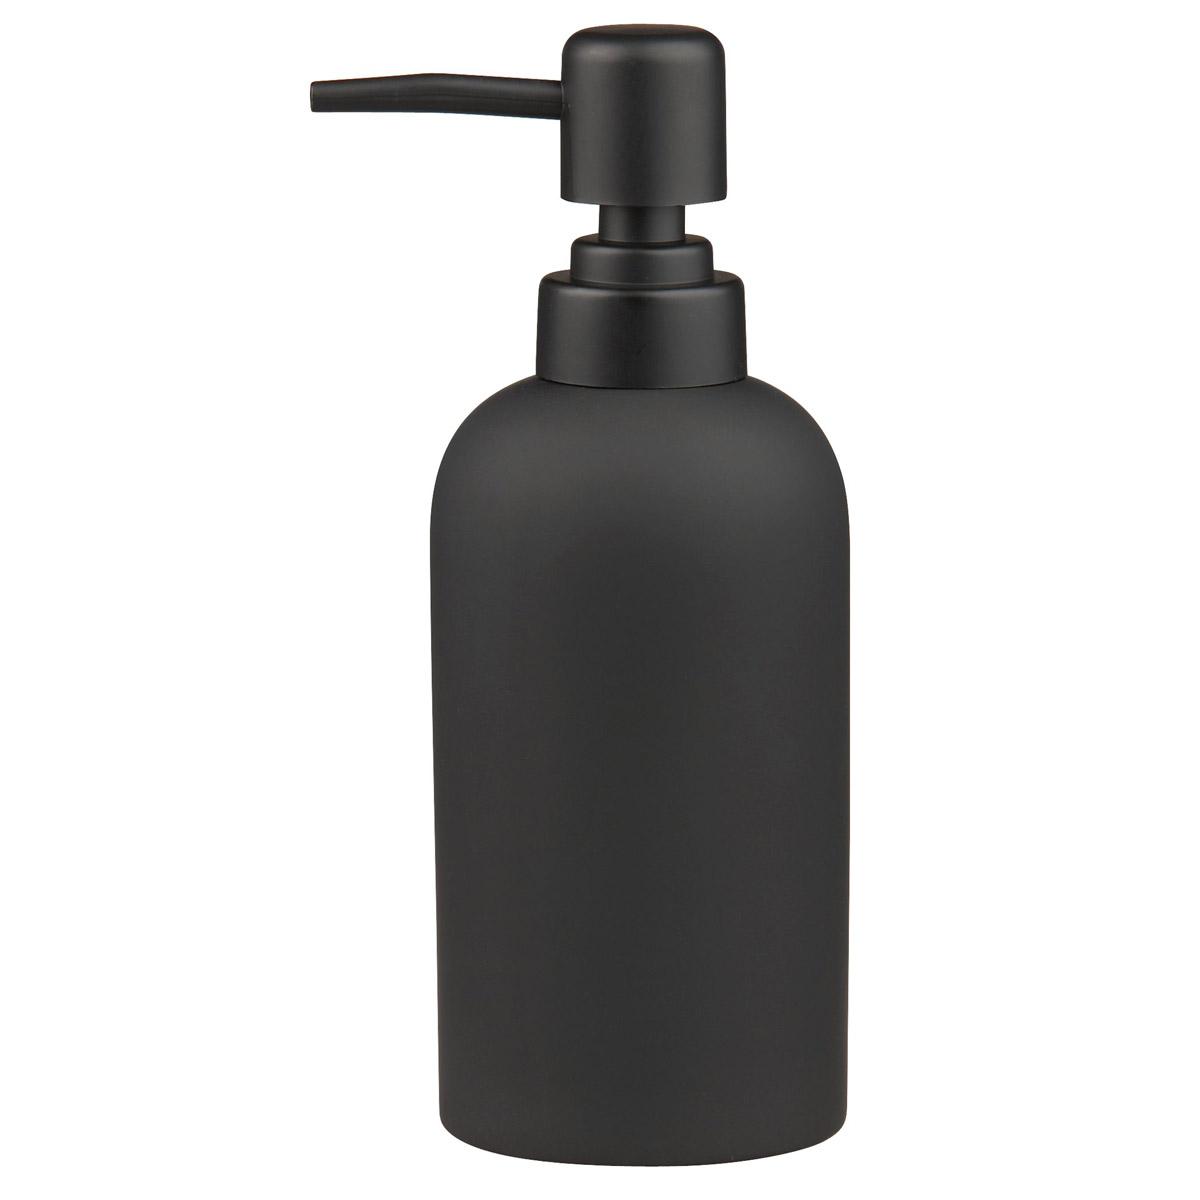 Black Rubber Coated Soap Dispenser